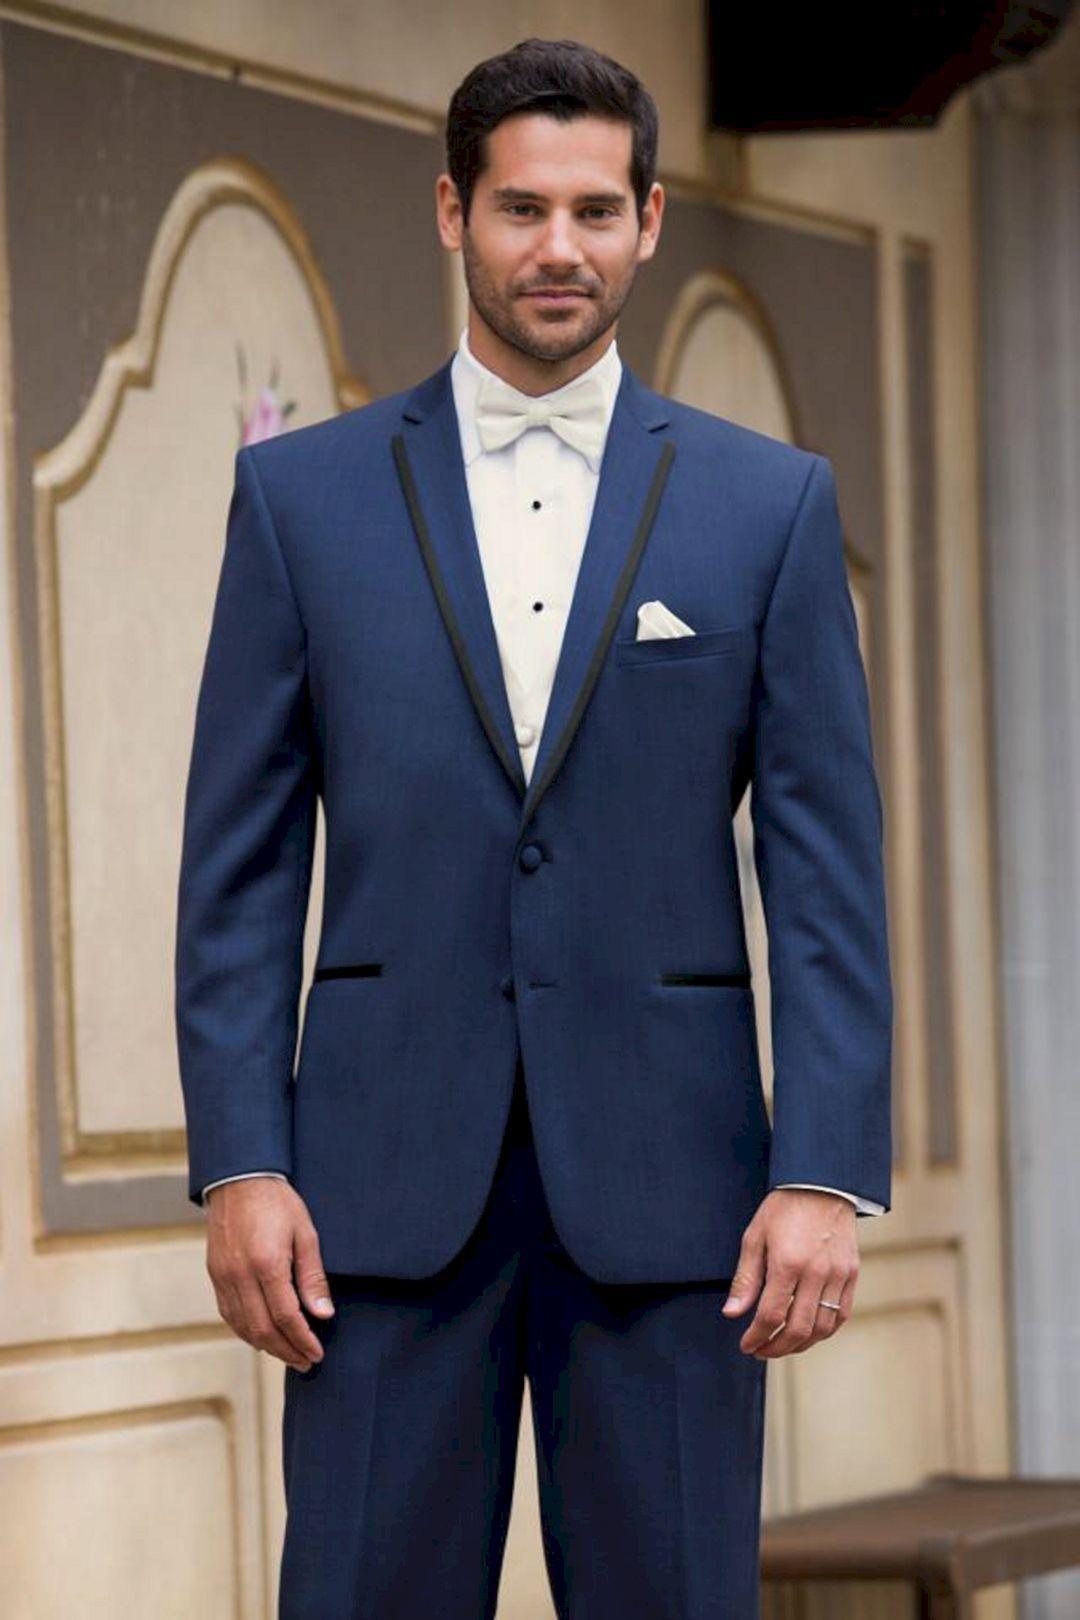 Modern suits or tuxedos for wedding model wedding dress ideas 45 best wedding dress wear a blue tuxedo ideas blue tuxedos junglespirit Images